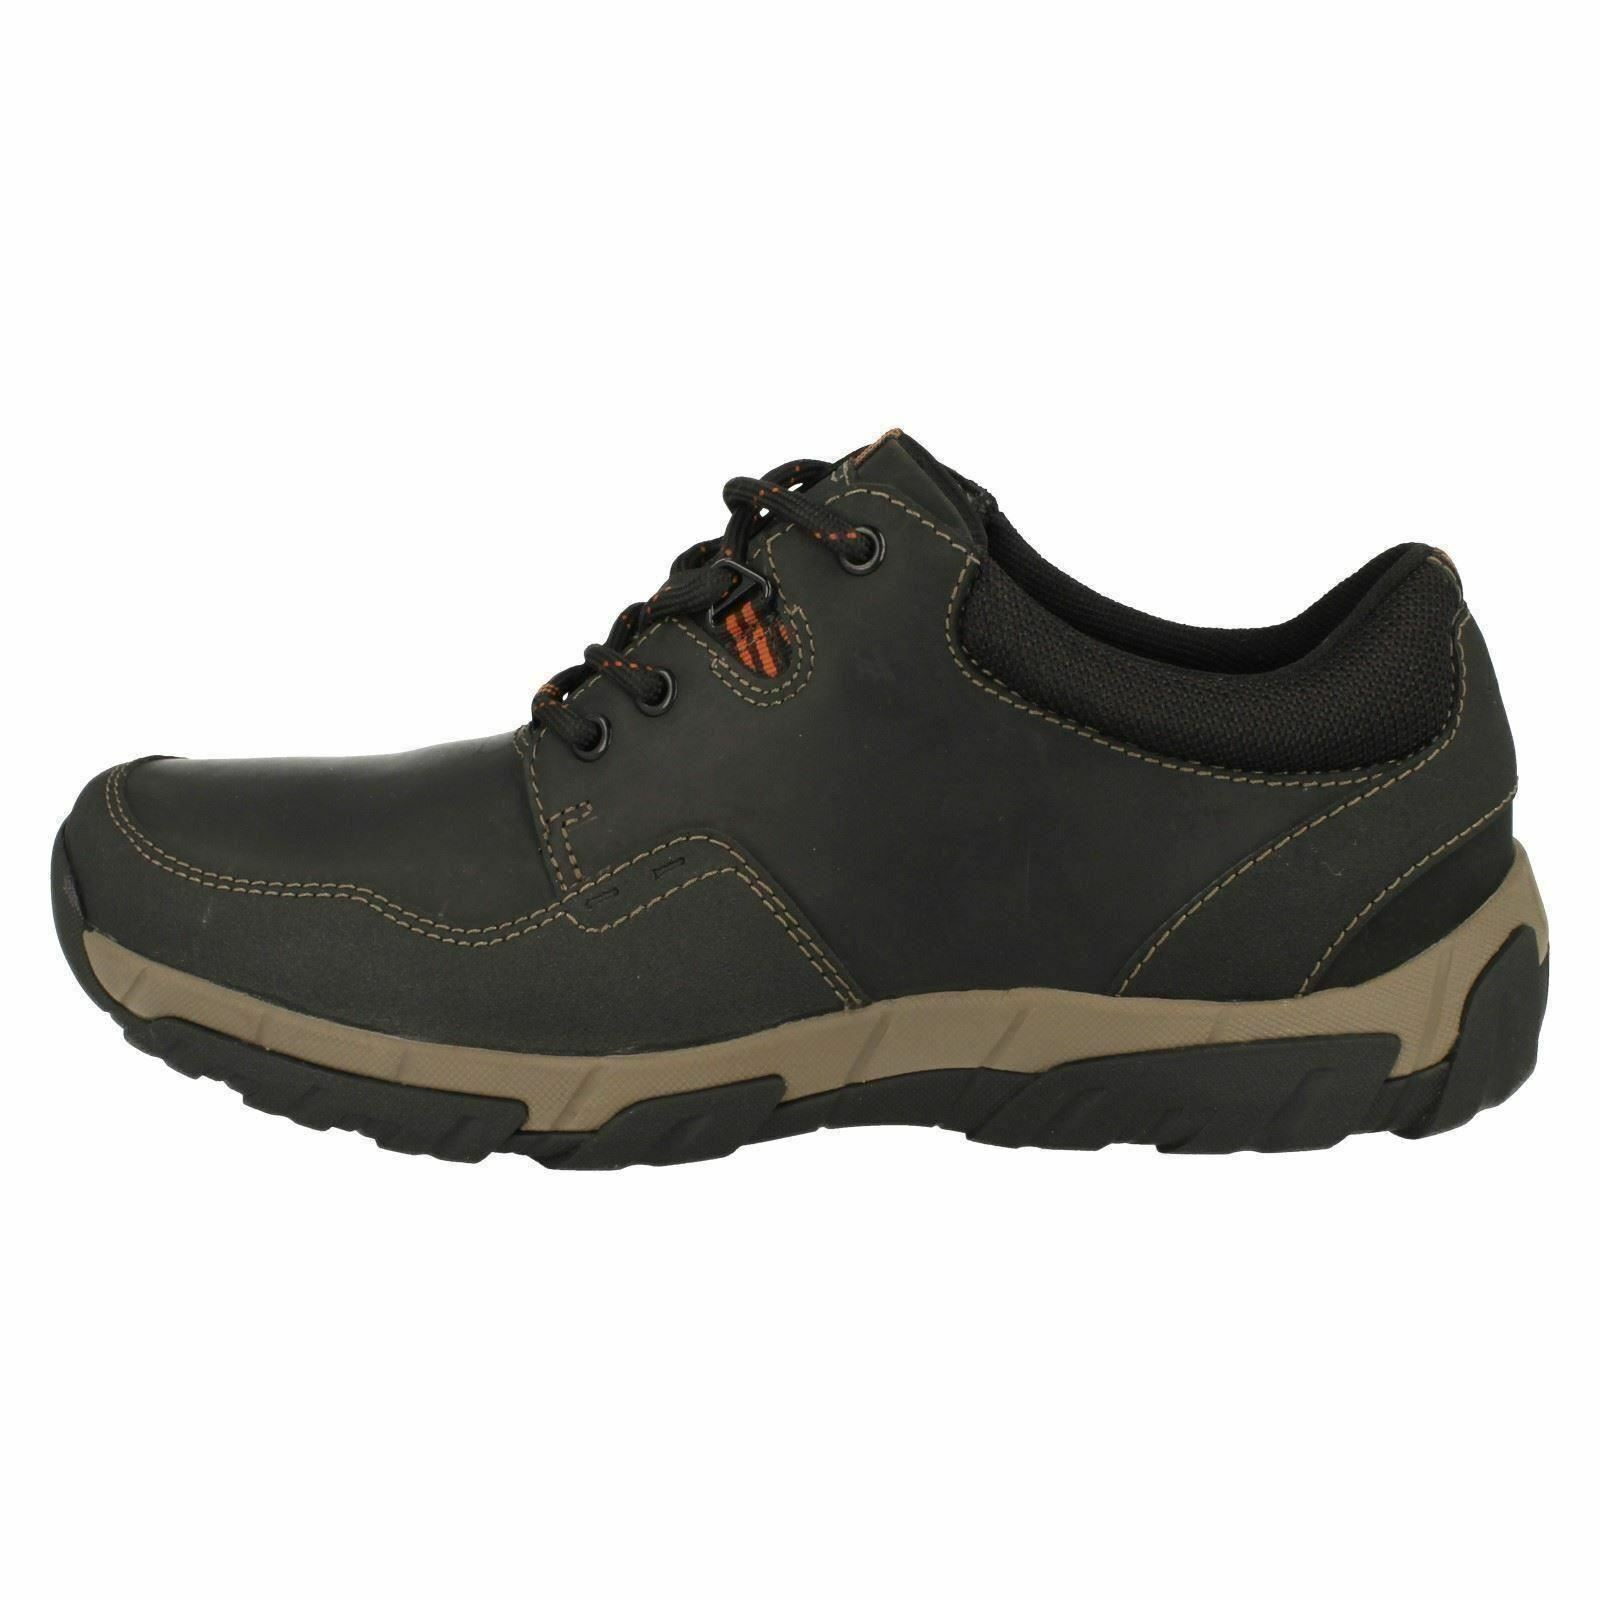 Clarks Walbeck Edge schwarzes Leder Herren Schuhe